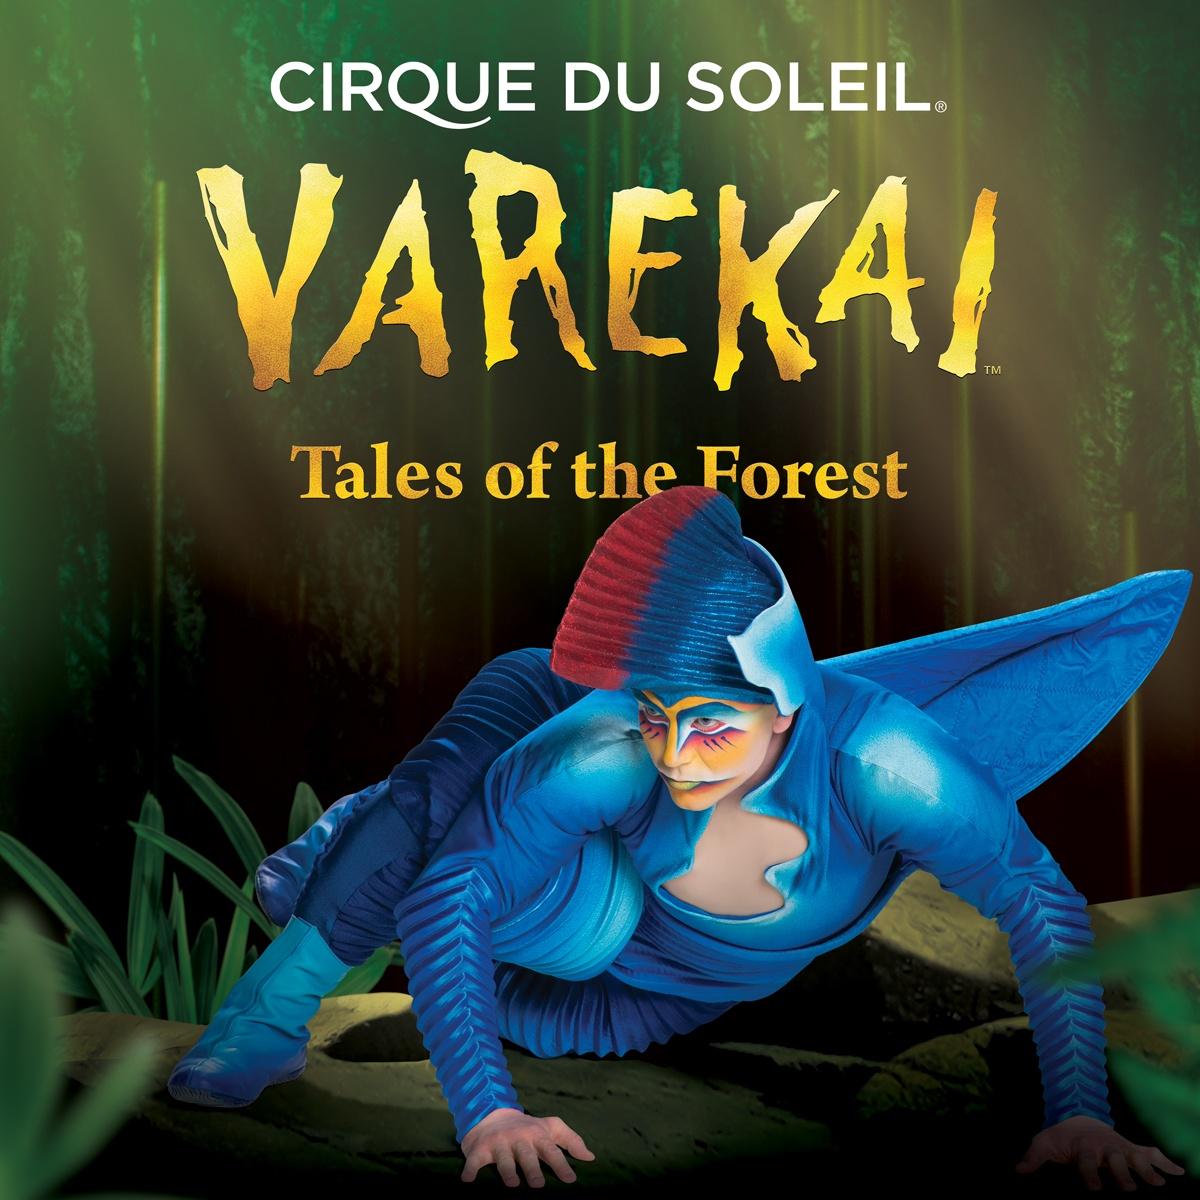 cirque du soleil italiano  VAREKAI DEL CIRQUE DU SOLEIL ANNUNCIA UN NUOVO SHOW! - Pala Alpitour